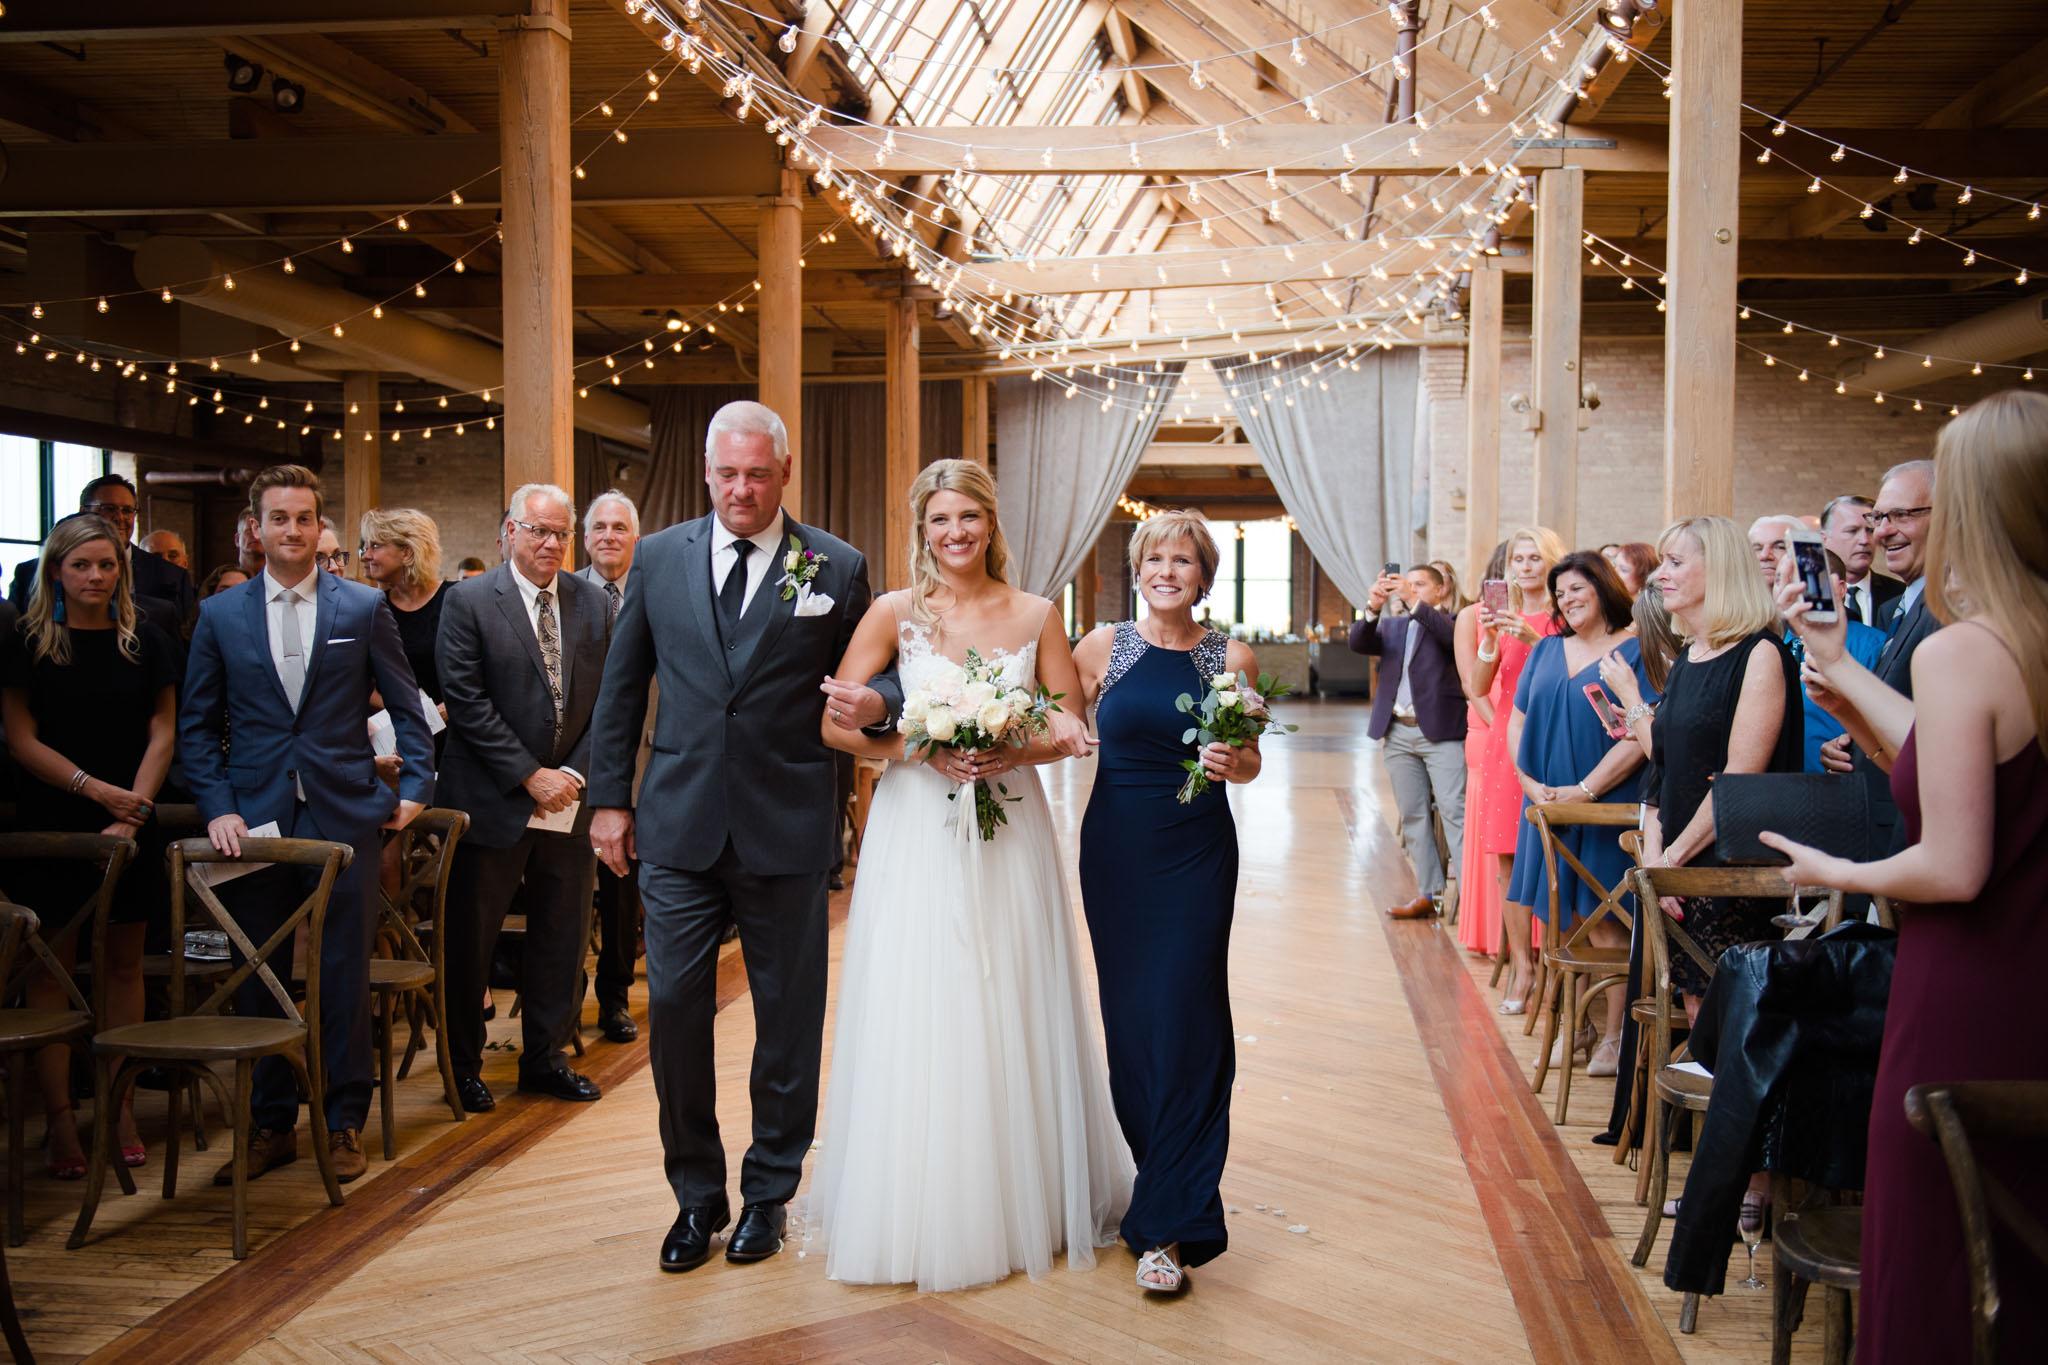 bridgeport-art-center-wedding-photos-20.jpg